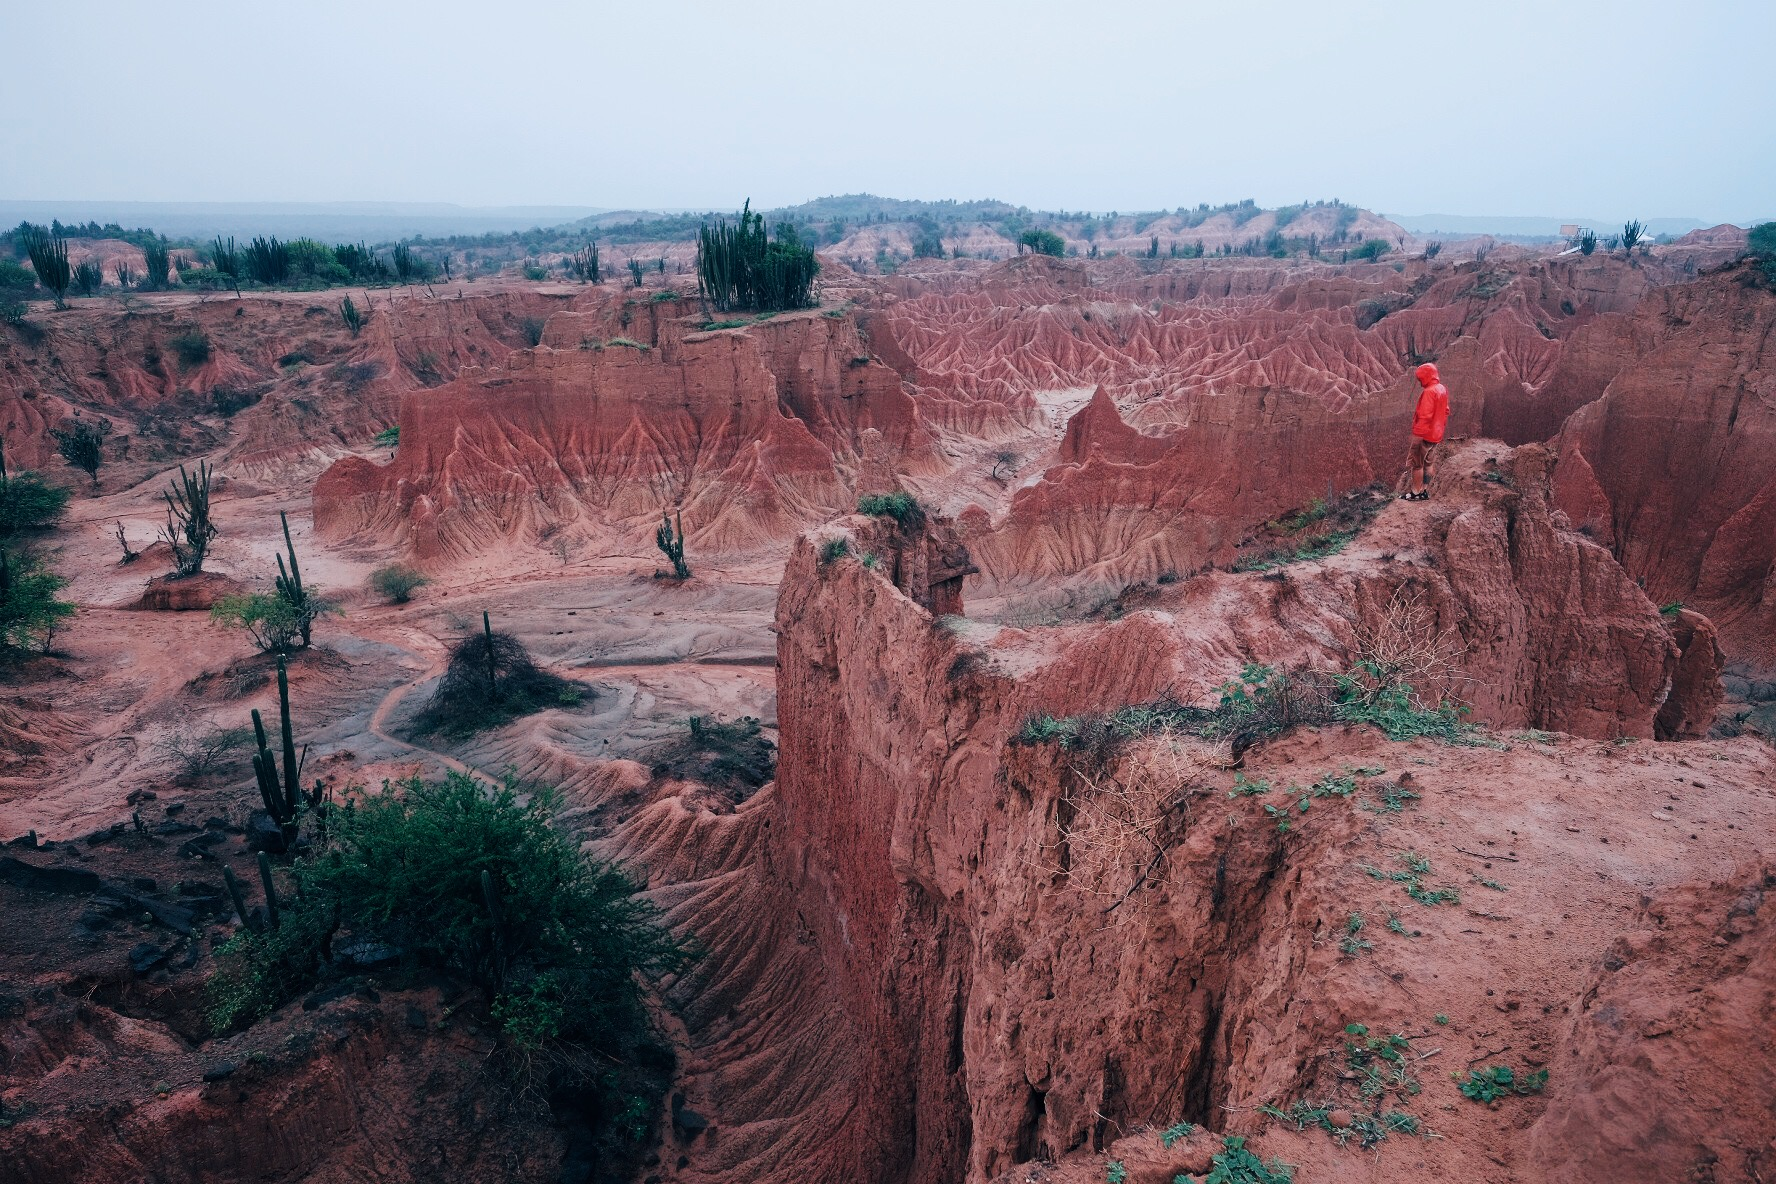 Admiring the incredible beauty of the  Tatacoa desert .